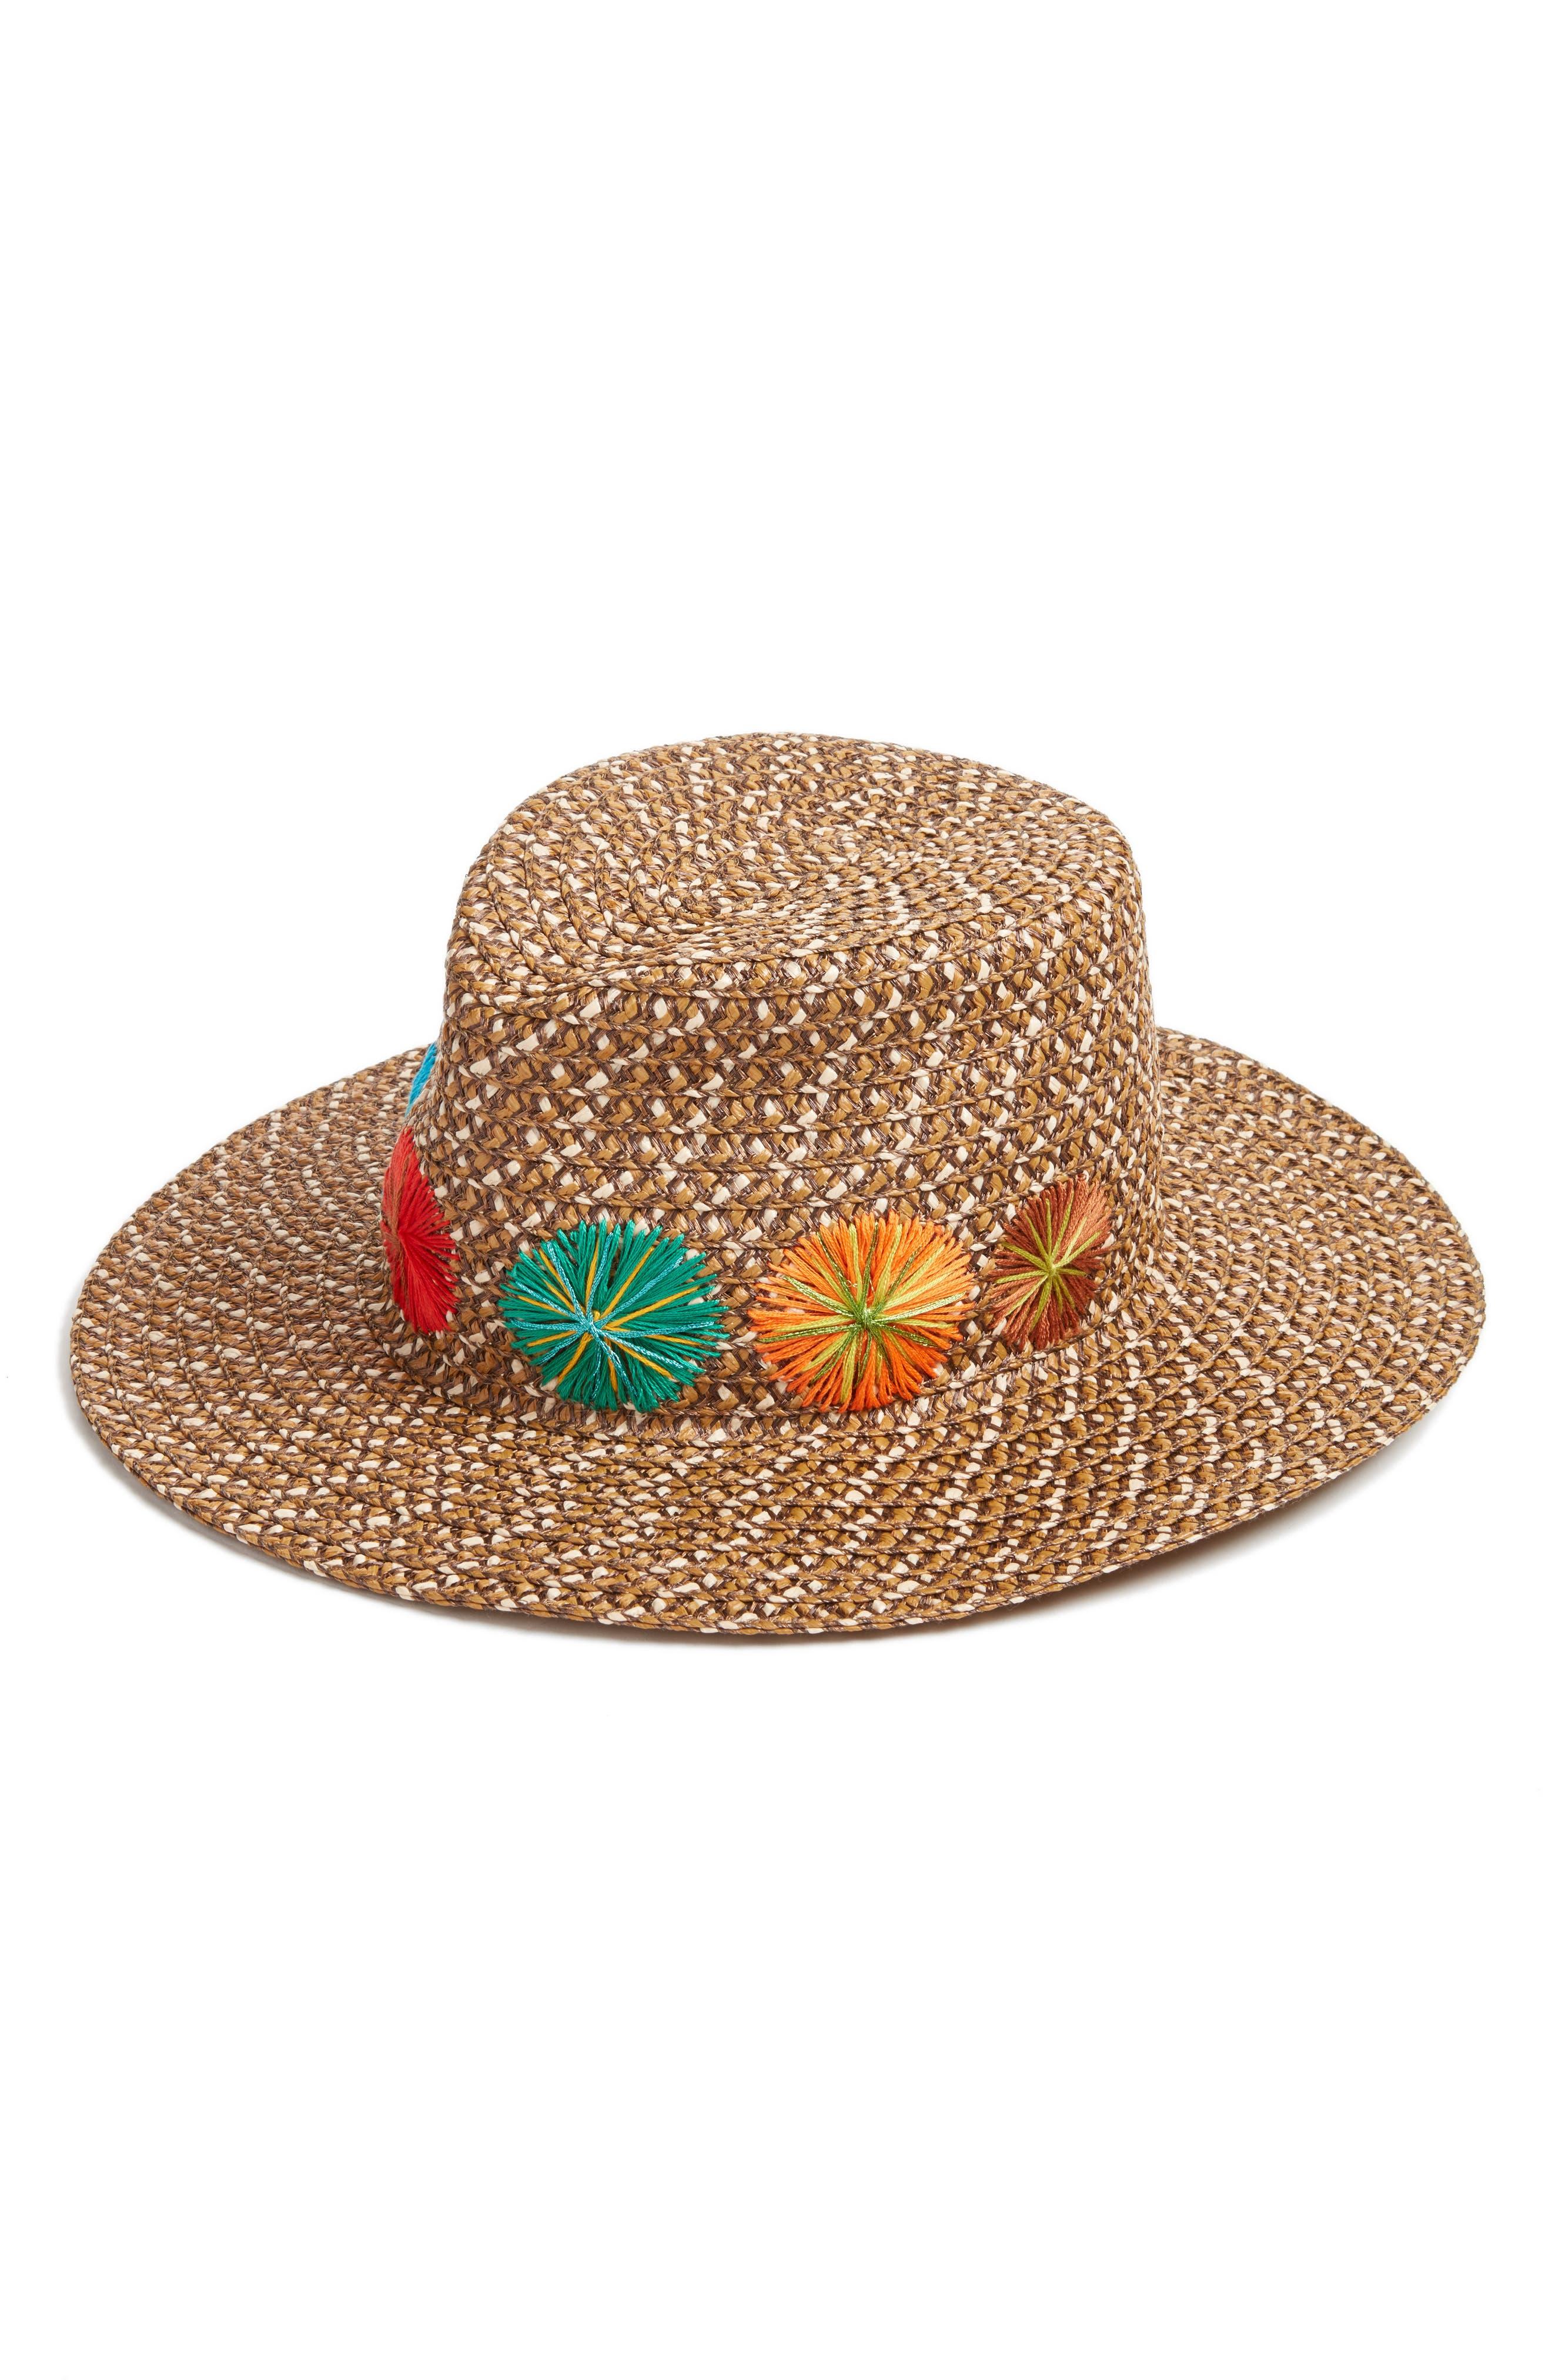 Alternate Image 1 Selected - Eric Javits Zanzibar Packable Squishee® Hat